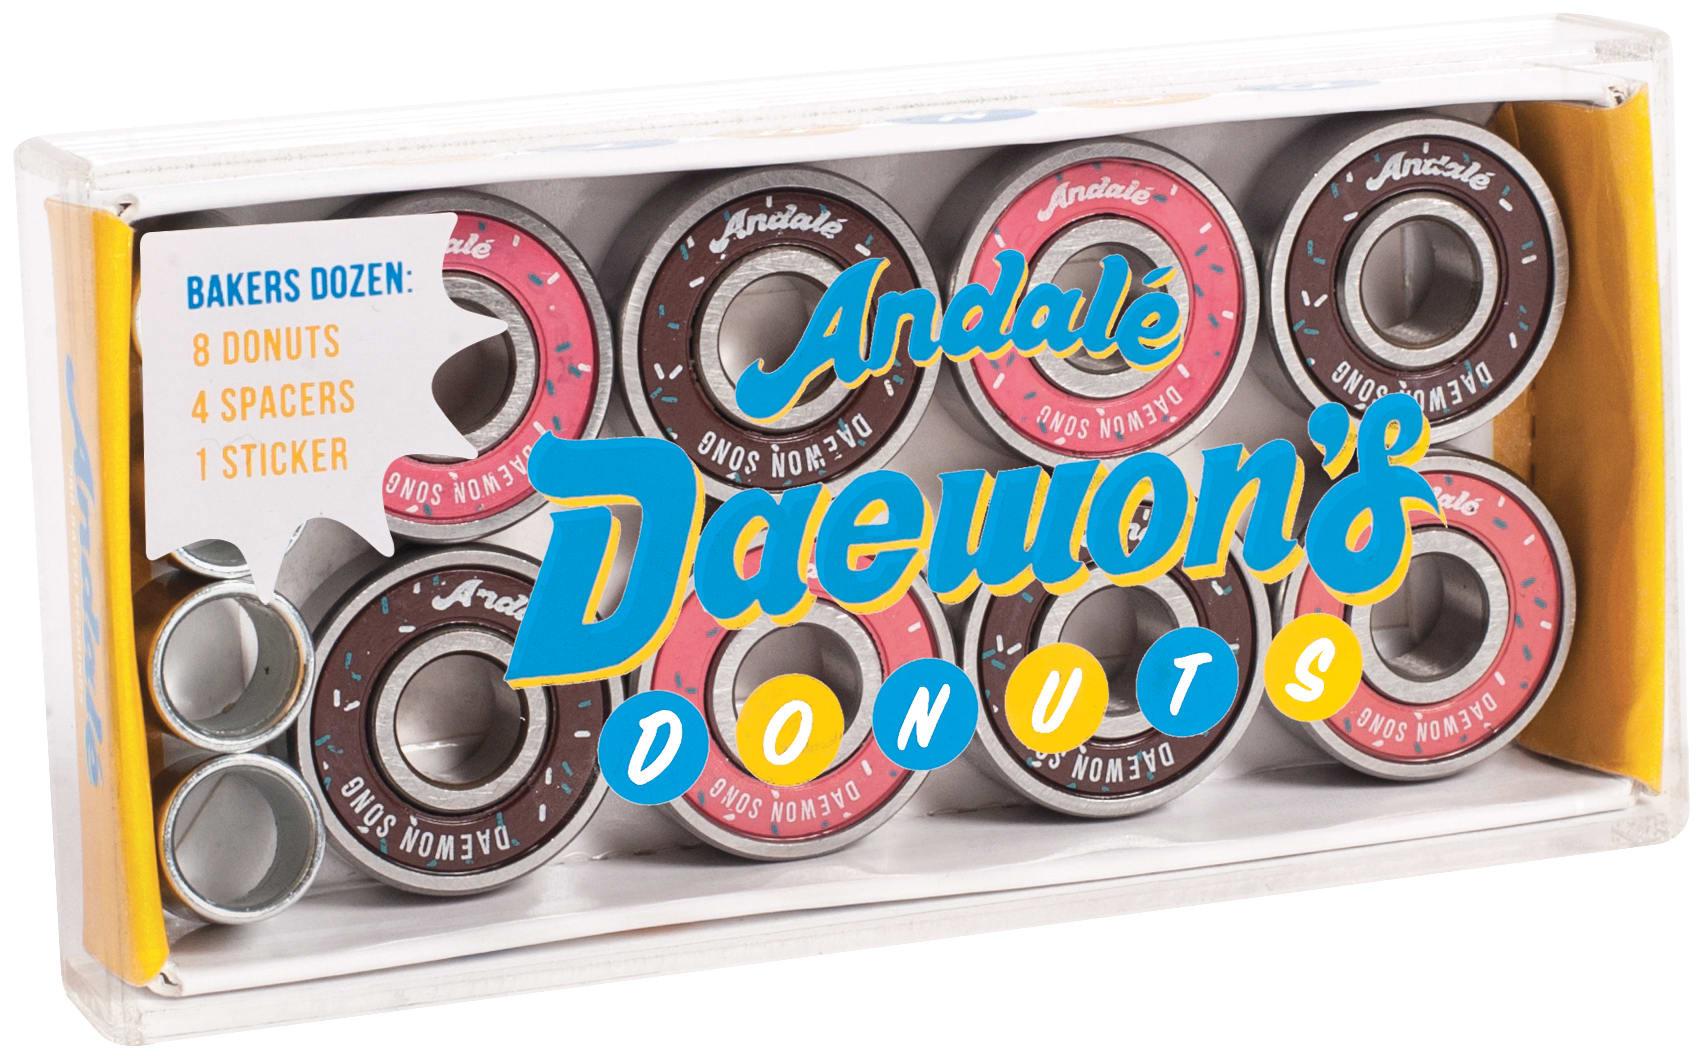 Image of Andale Daewon's Donut Box Skateboard Bearings